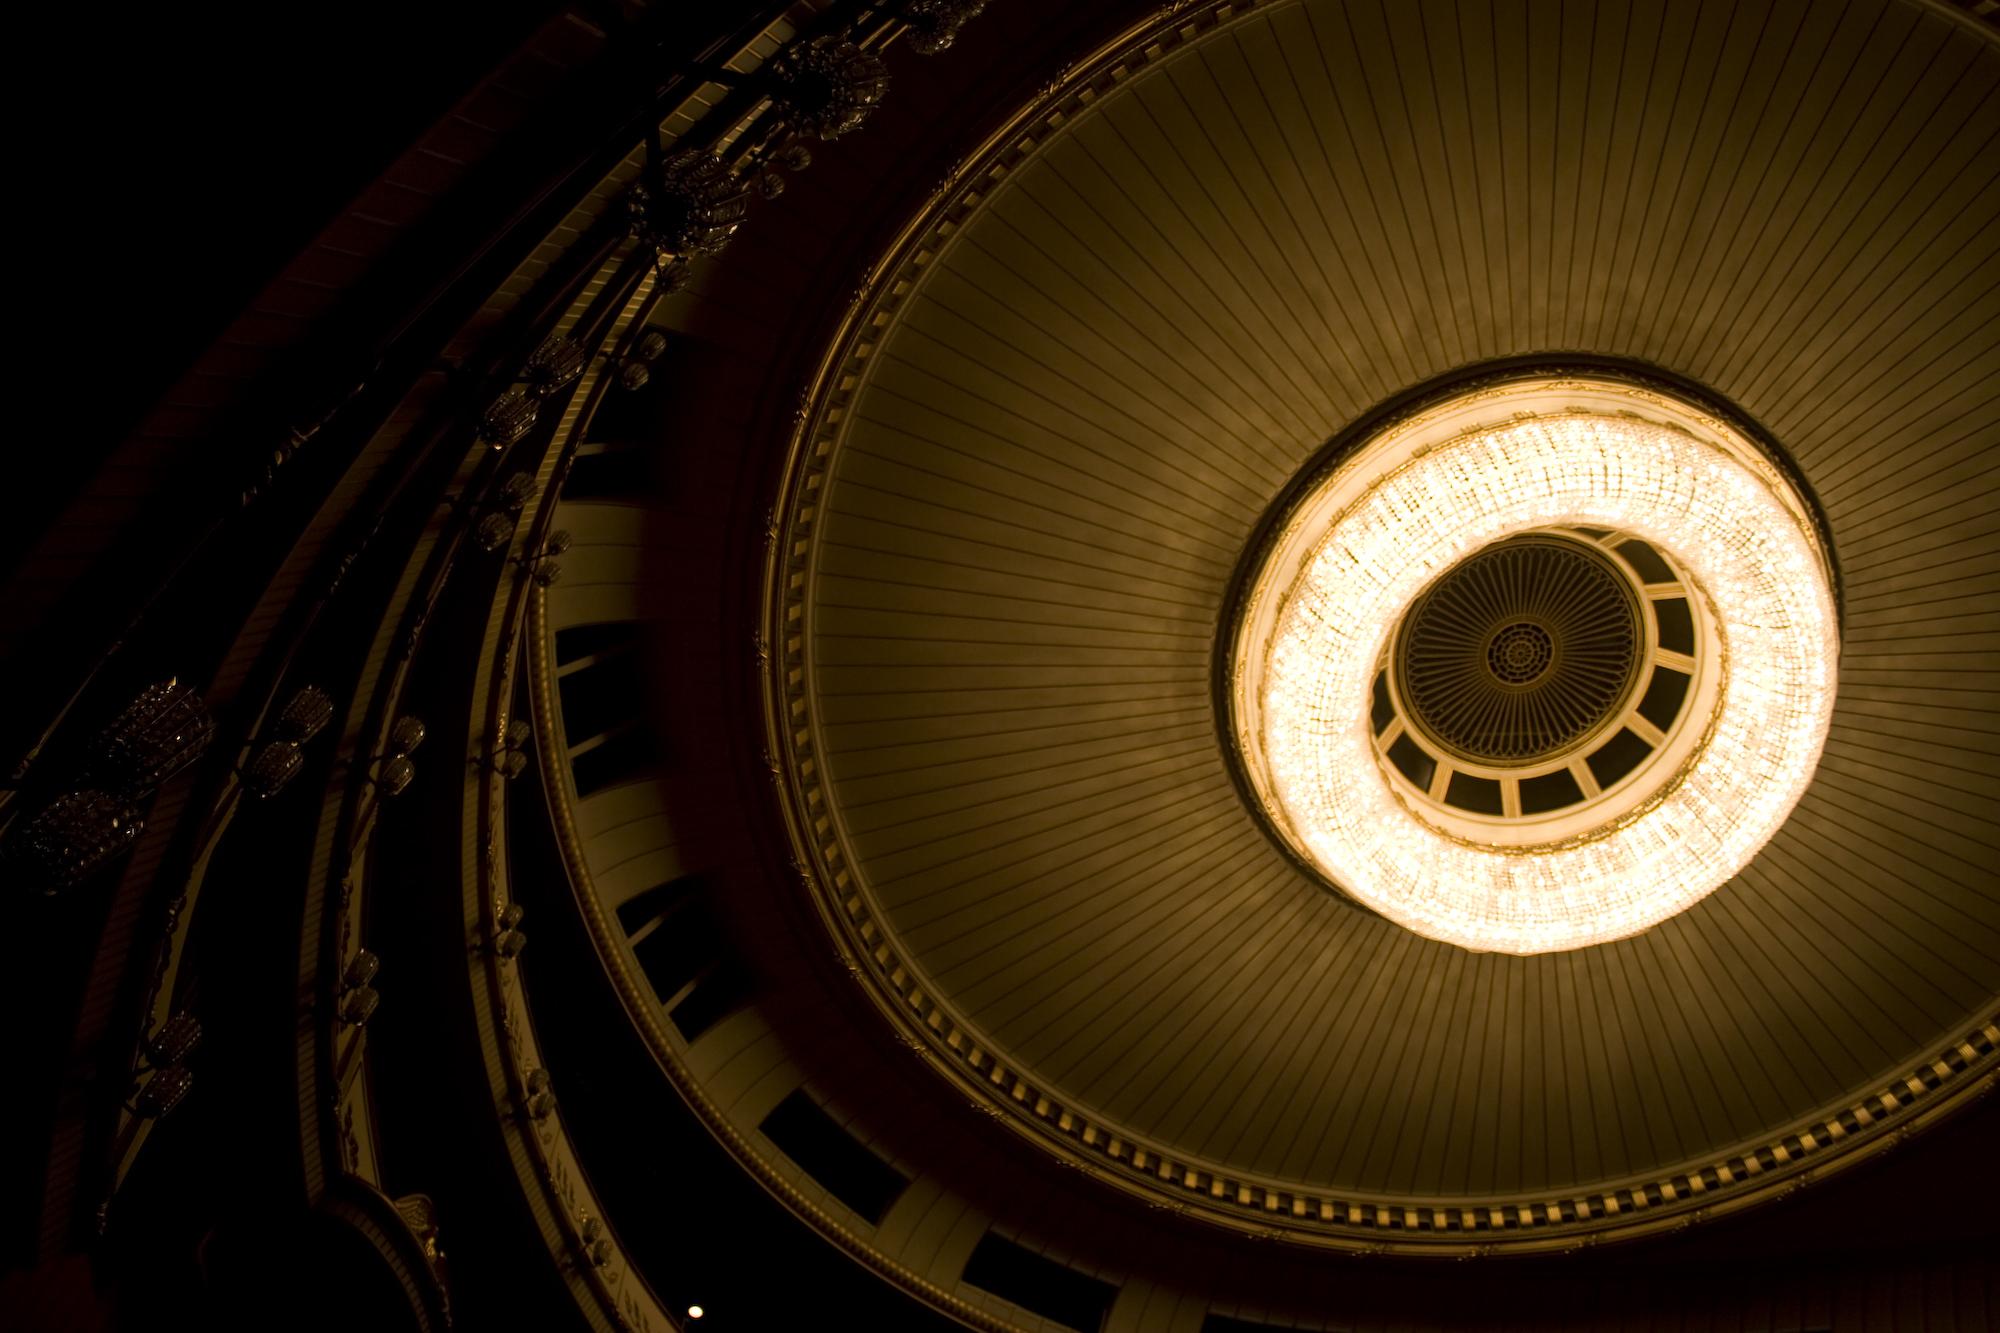 Filevienna state opera chandelierg wikipedia filevienna state opera chandelierg arubaitofo Images